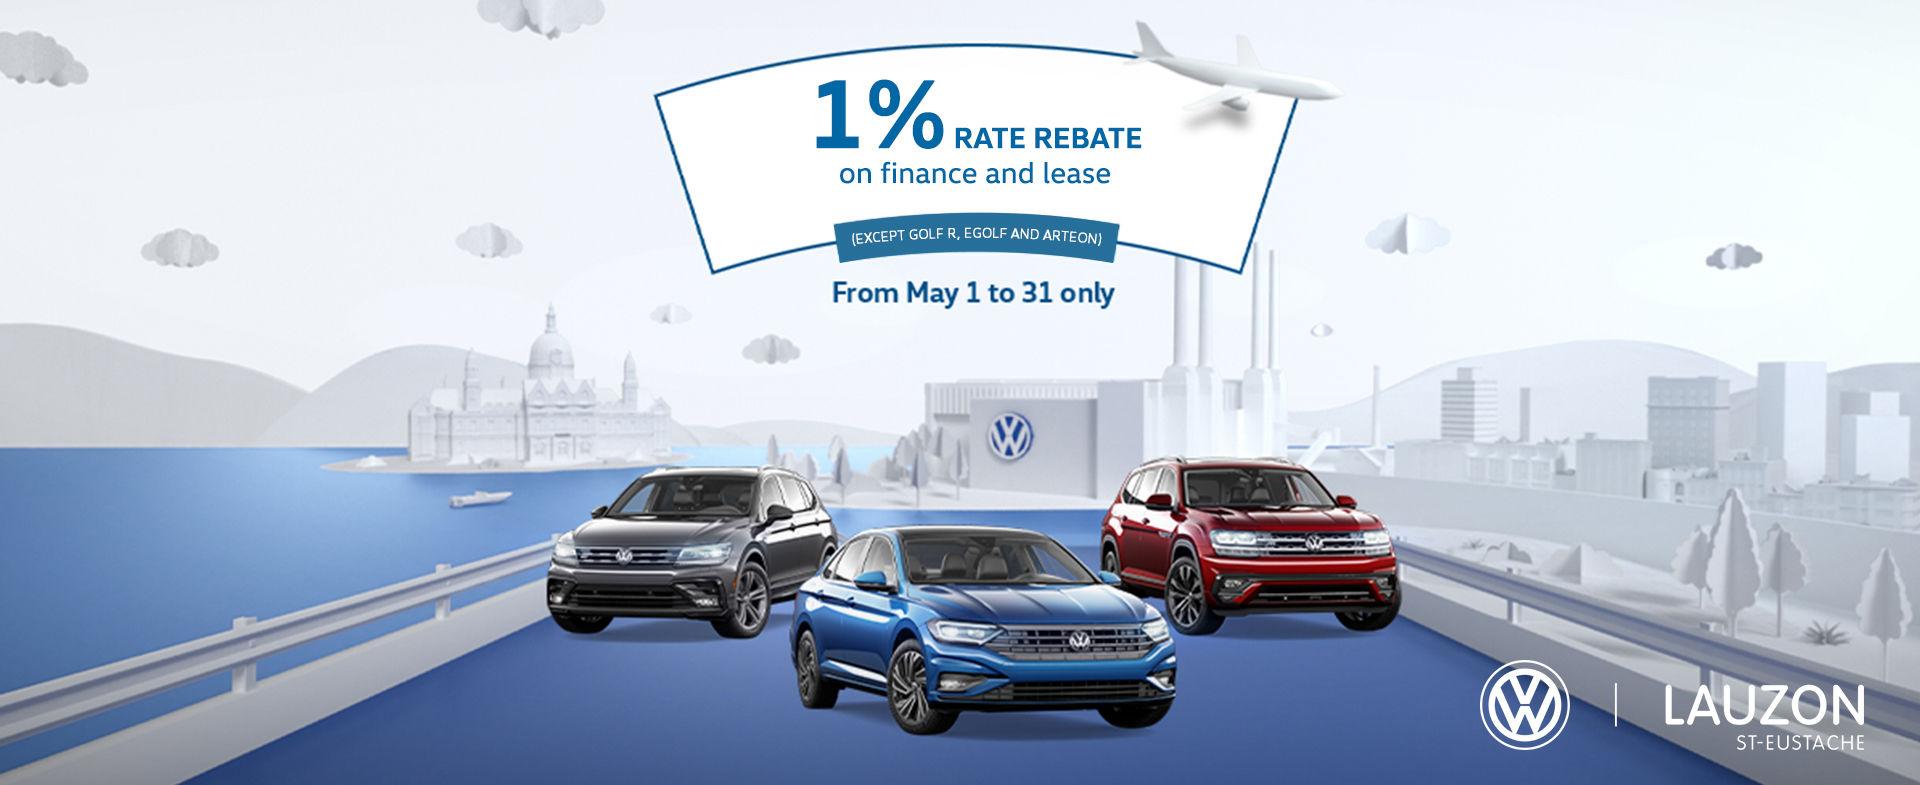 VW May promo 1% rebate